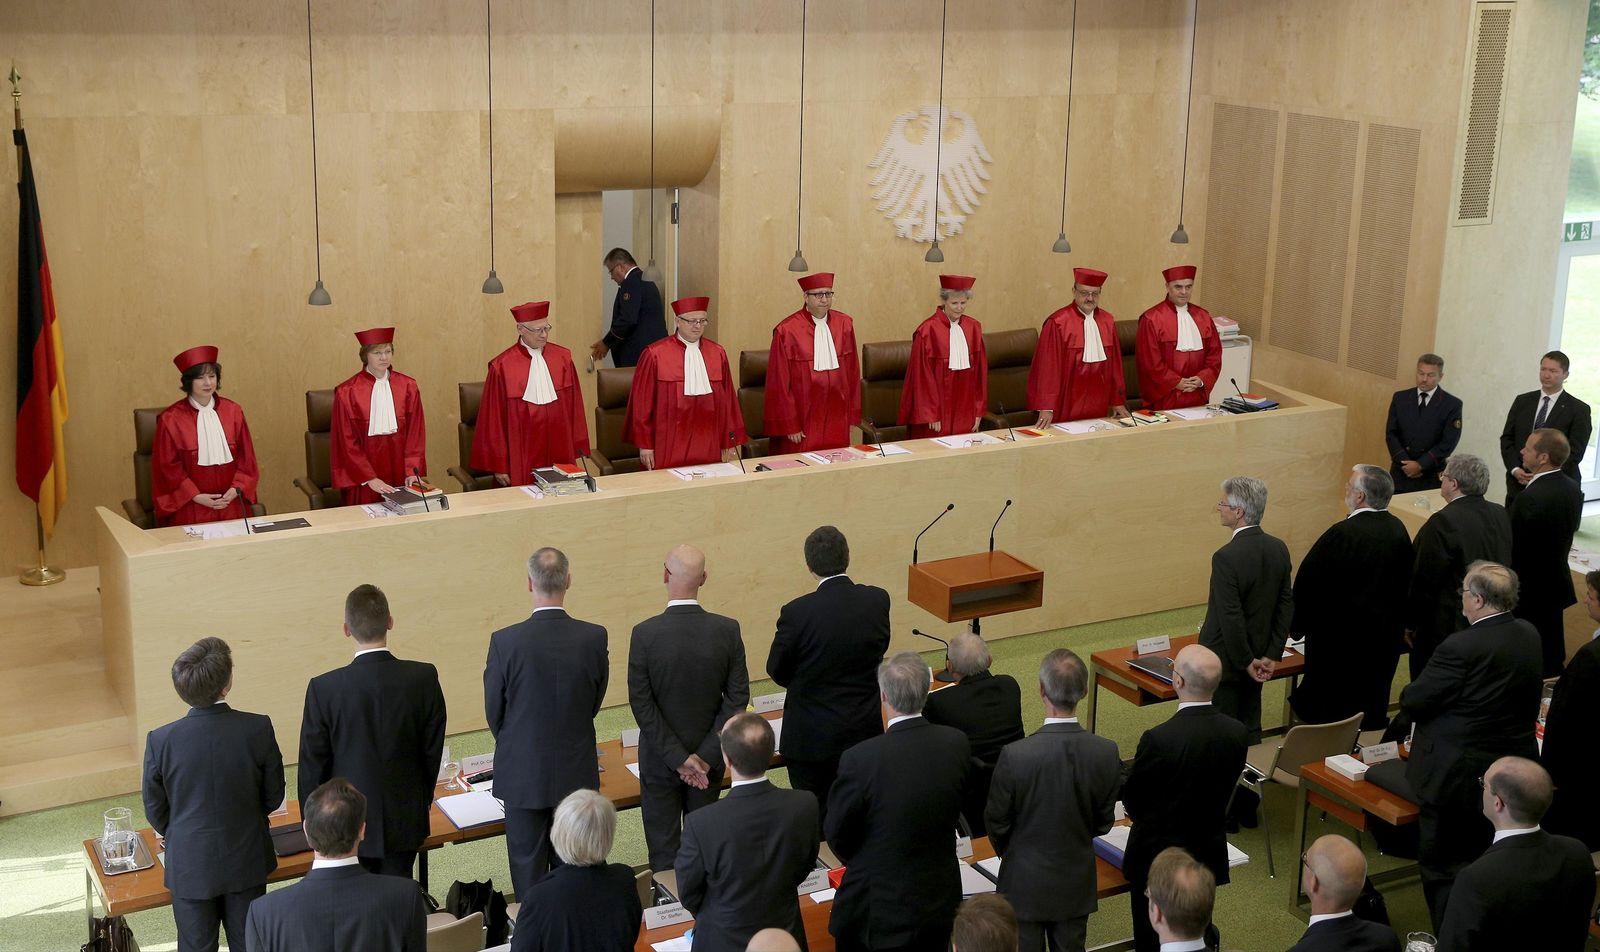 Germany court